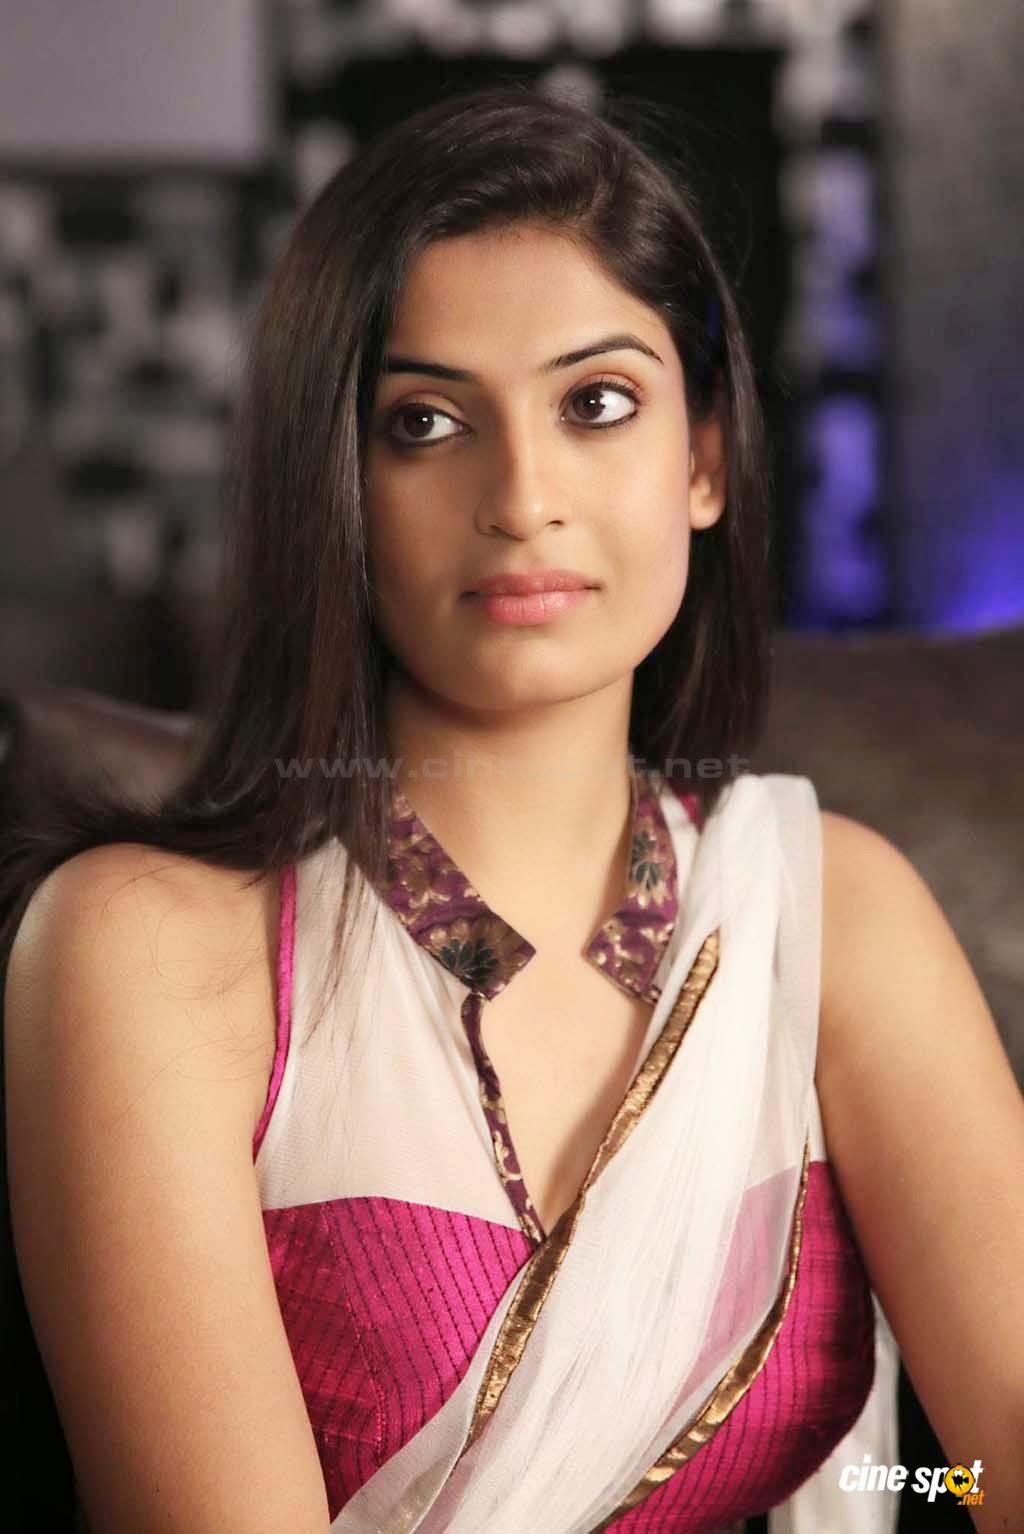 Megha Name 3d Wallpaper Bollywood Actresses Actors Celebrities Hot Photos Images